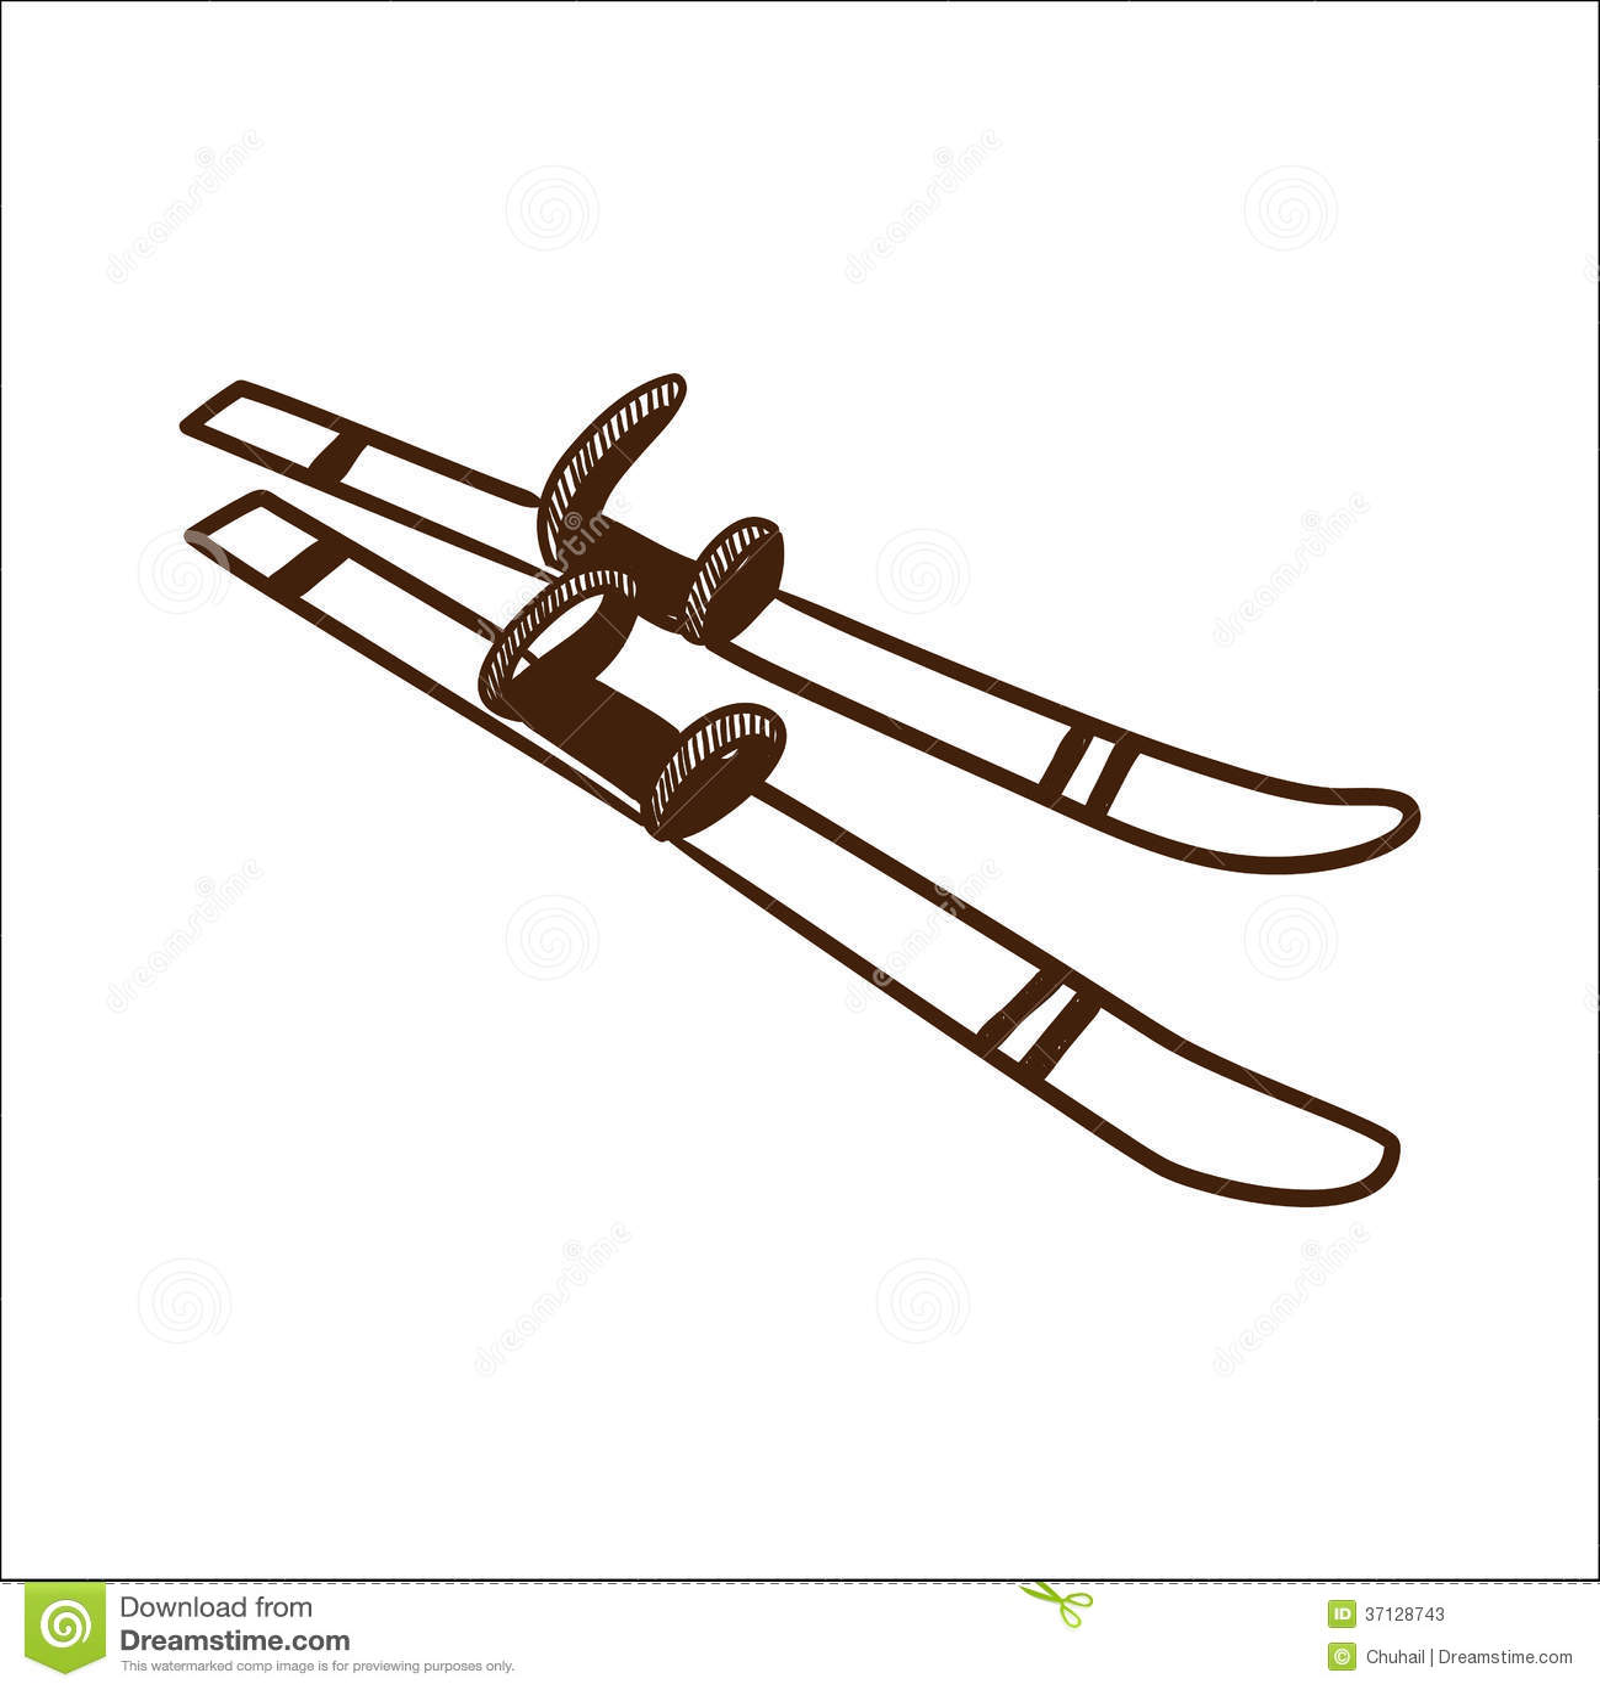 Vintage ski equipment cartoon sketch vector illustration